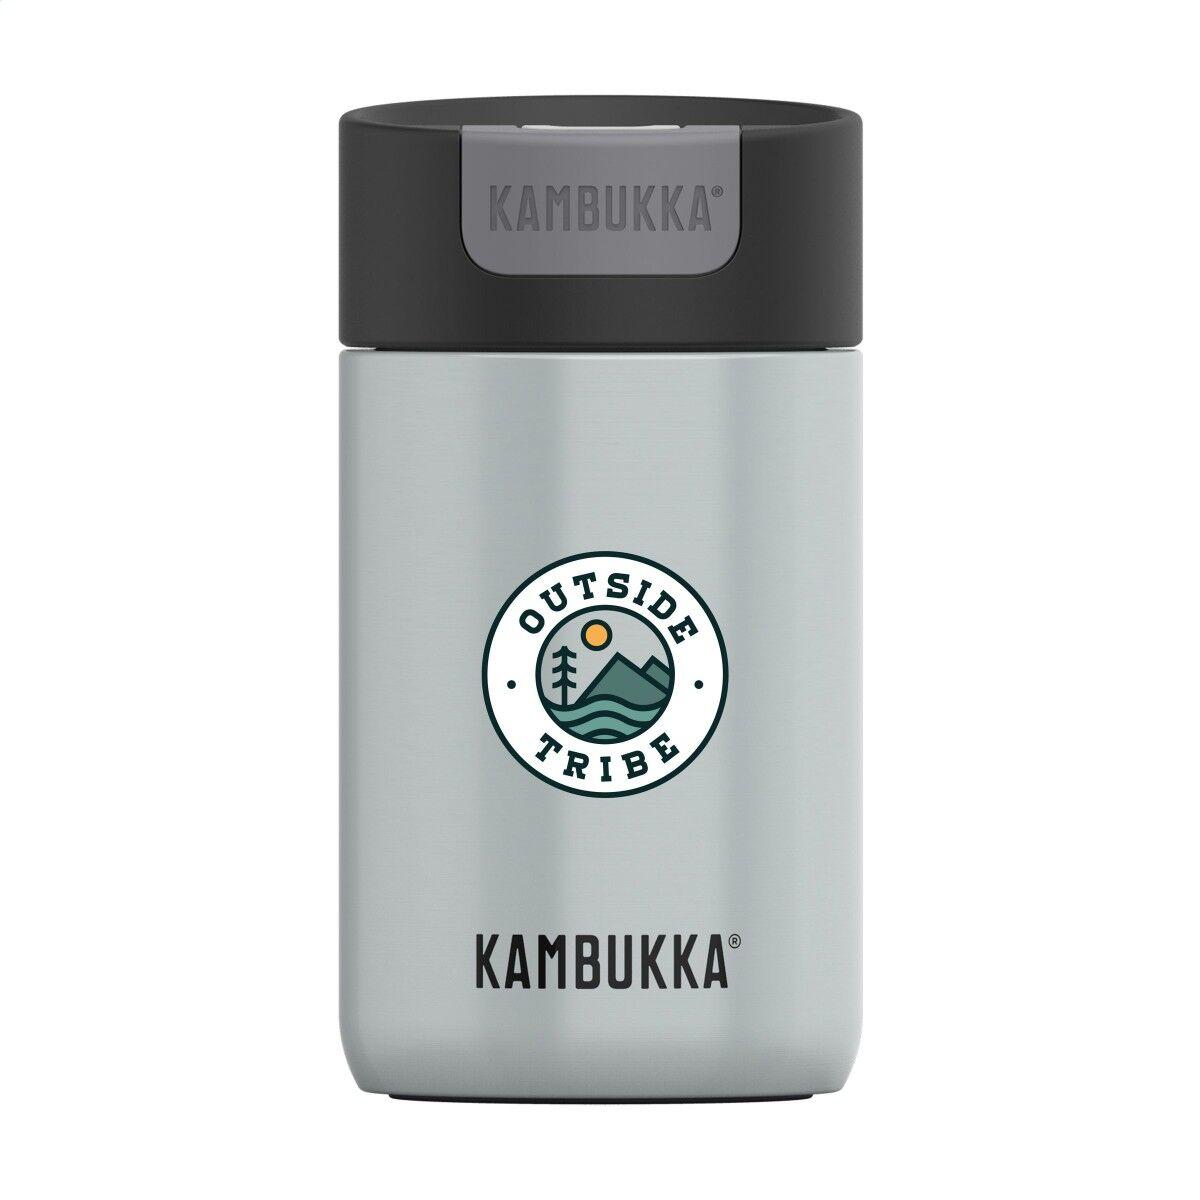 Kambukka Handy Thermal Bottle in Light Grey